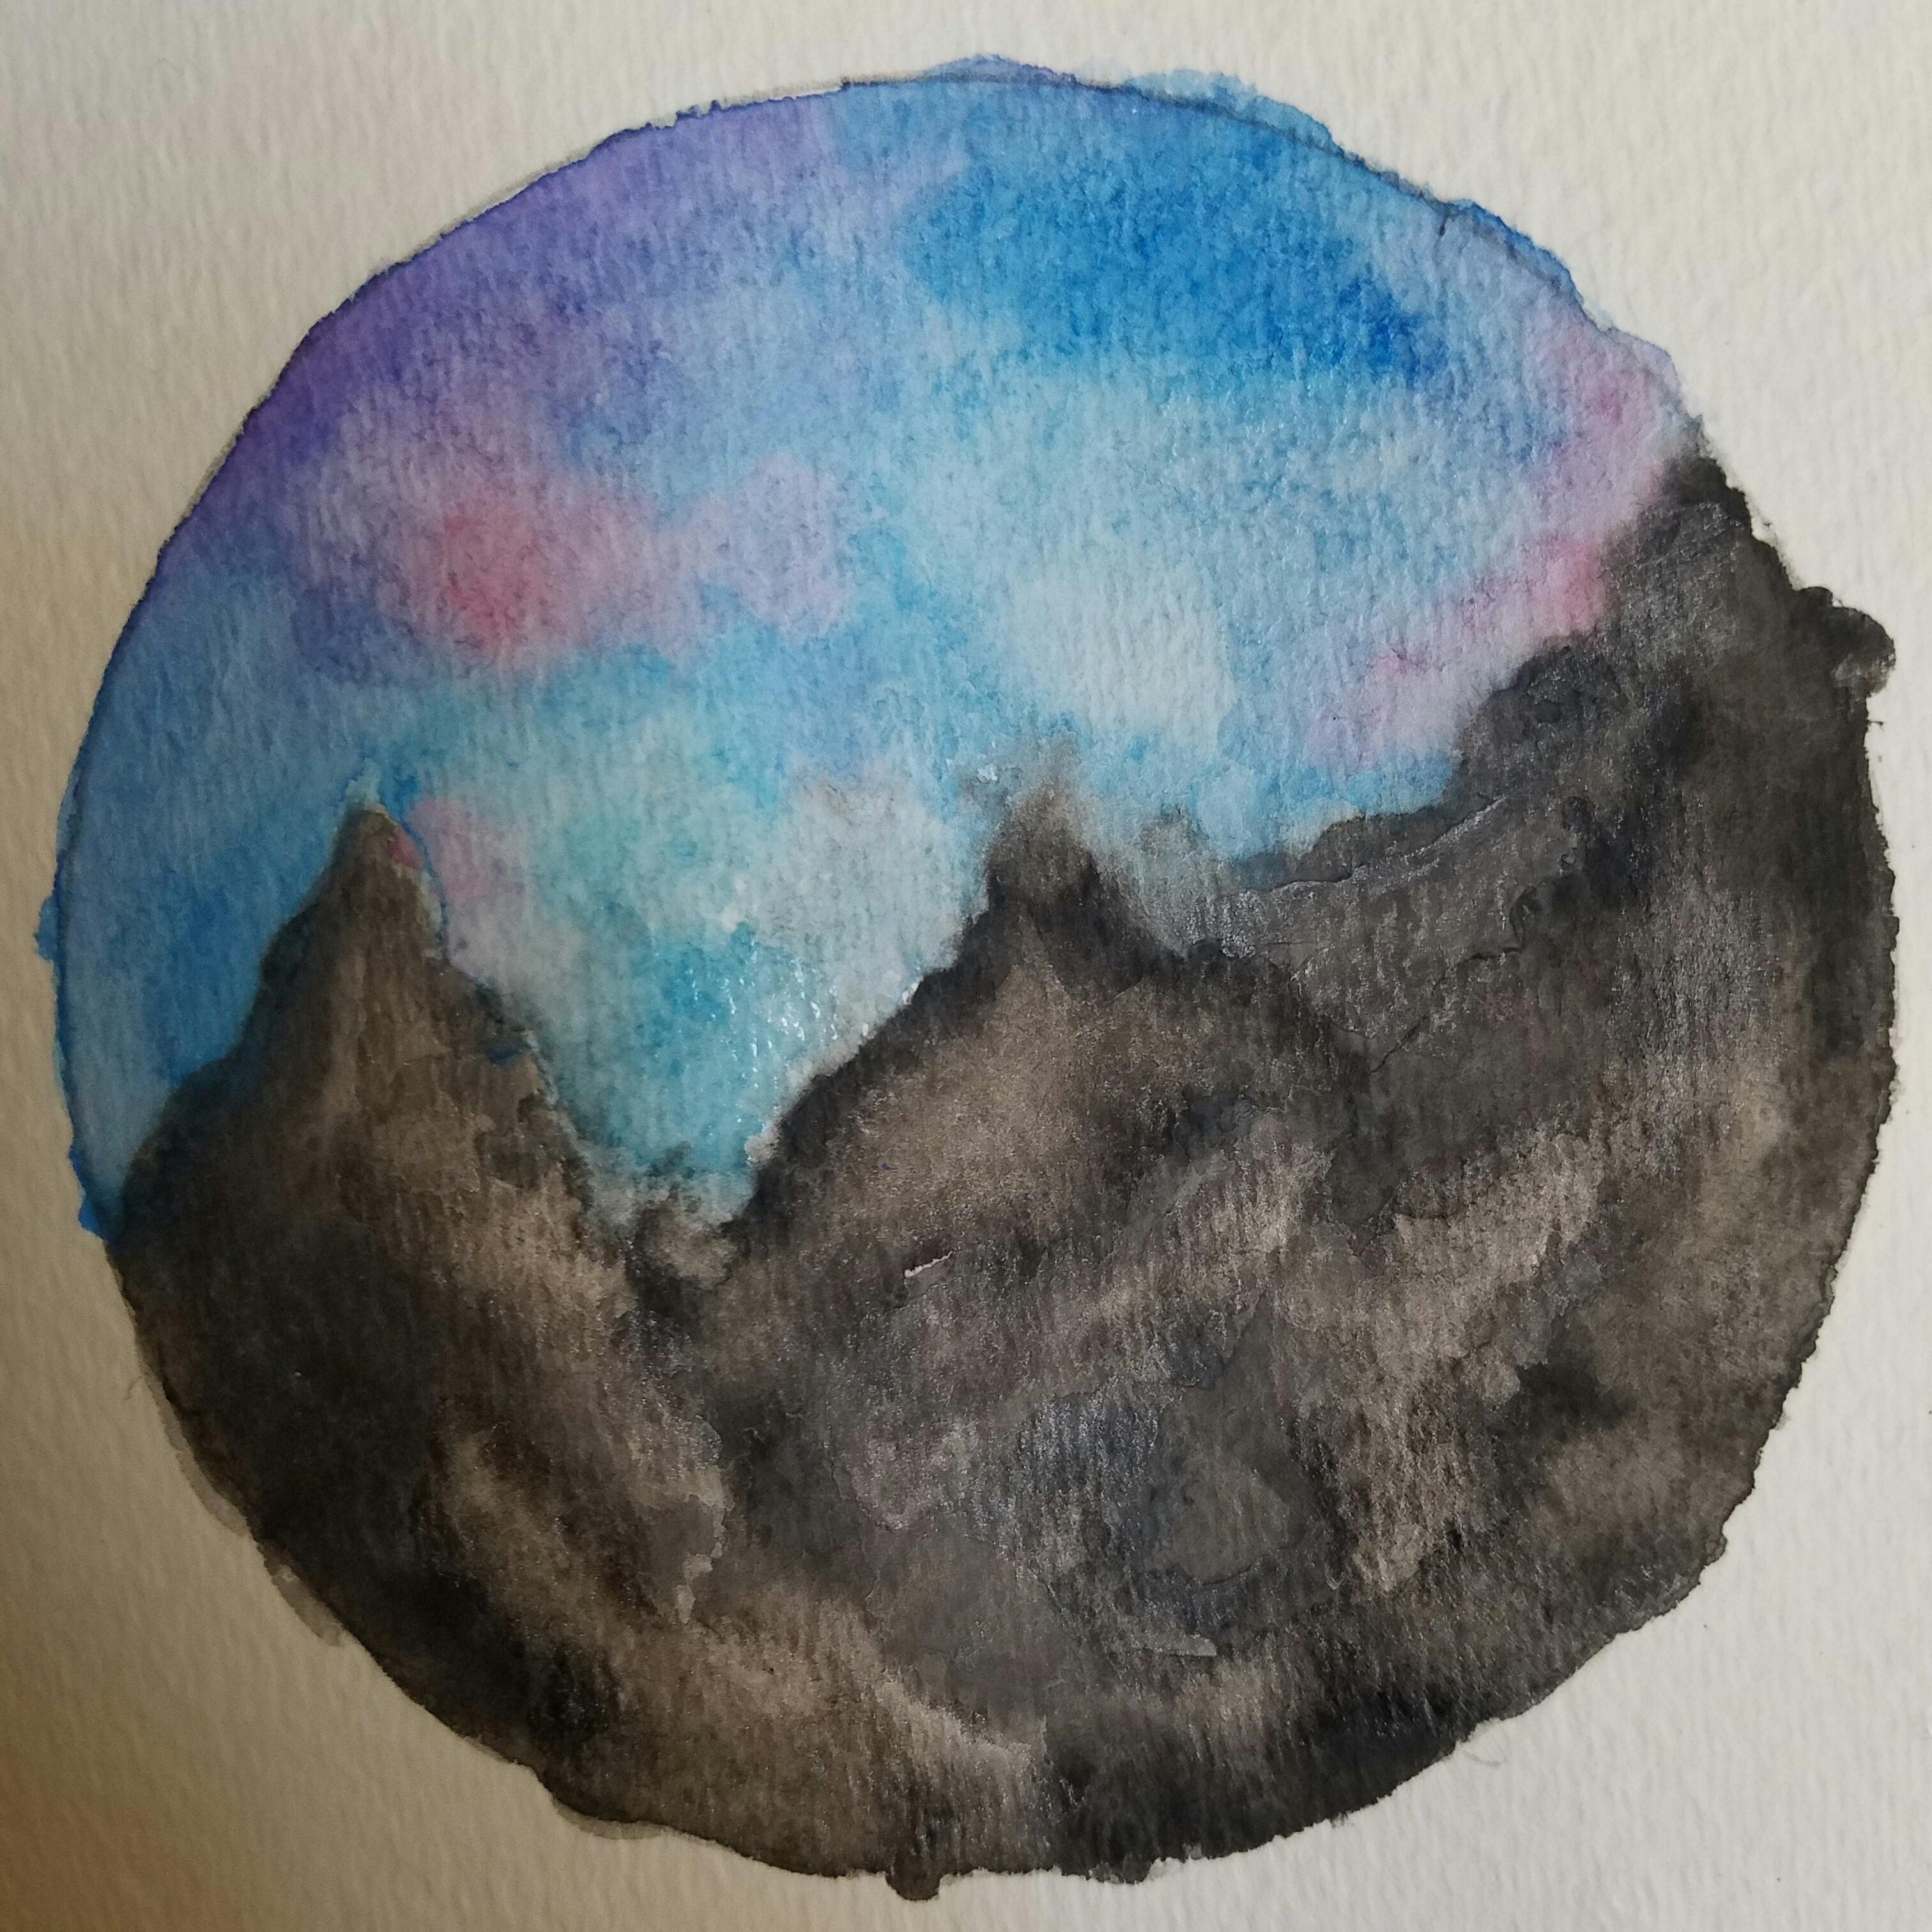 3024x3024 Art In A Circle Seelio